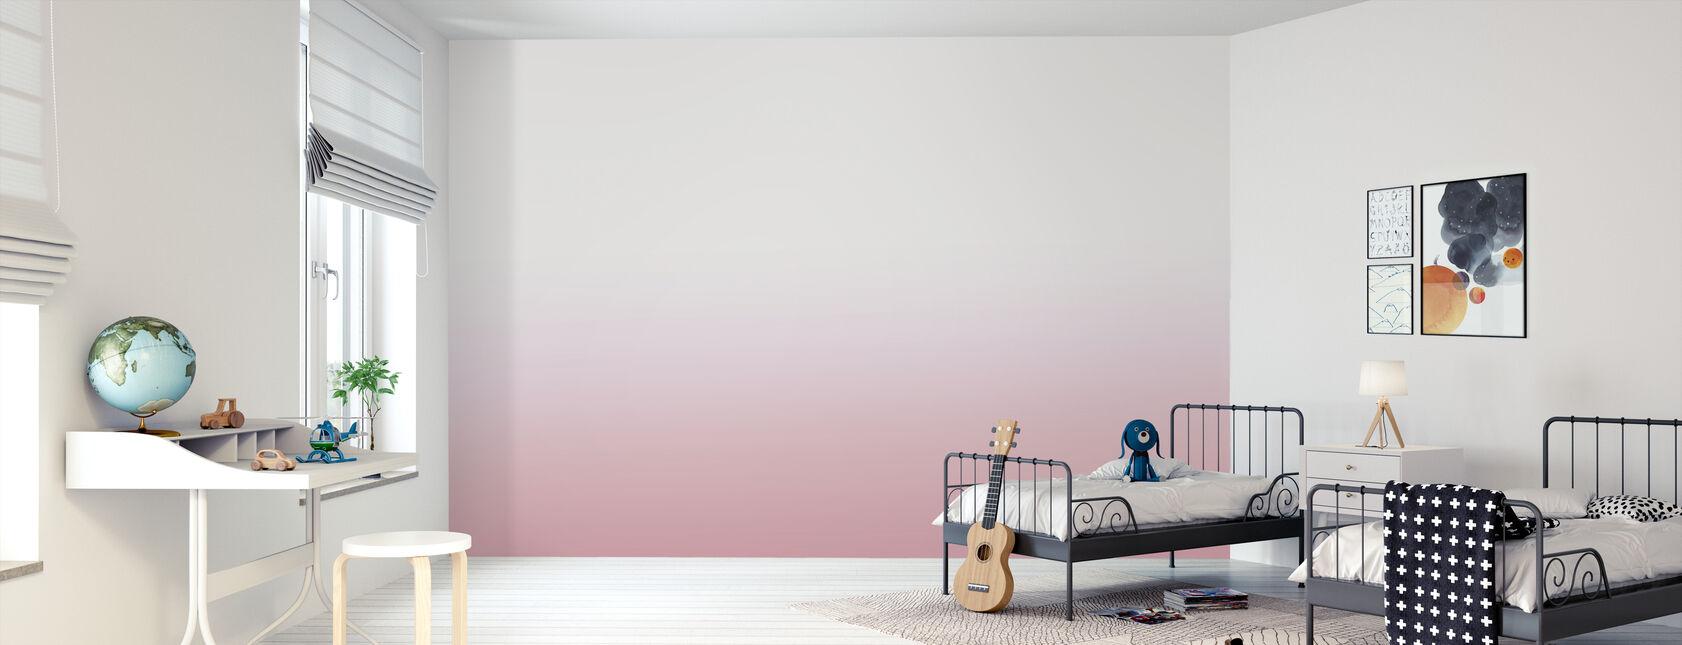 Fototapeter till babyrummet